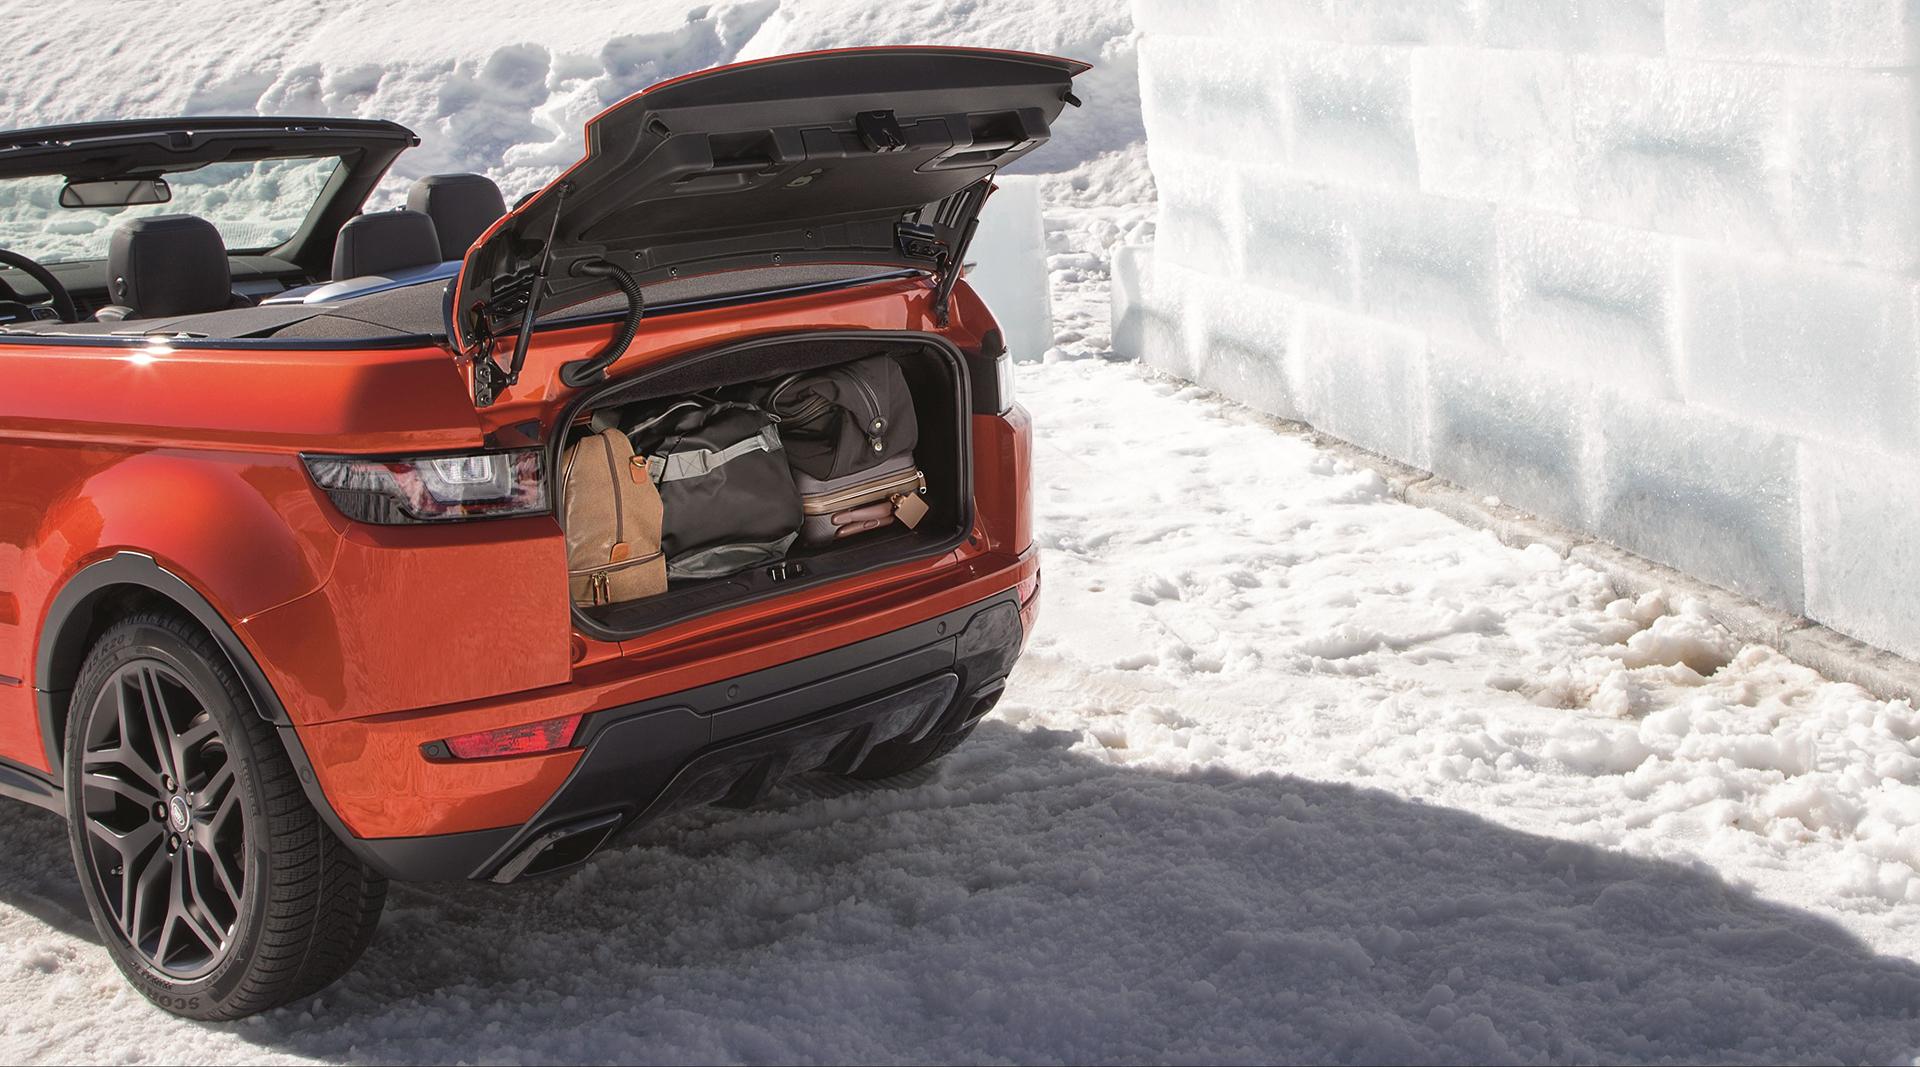 Land Rover Range Rover Evoque Convertible - rear compartment / coffre arrière - open / ouvert